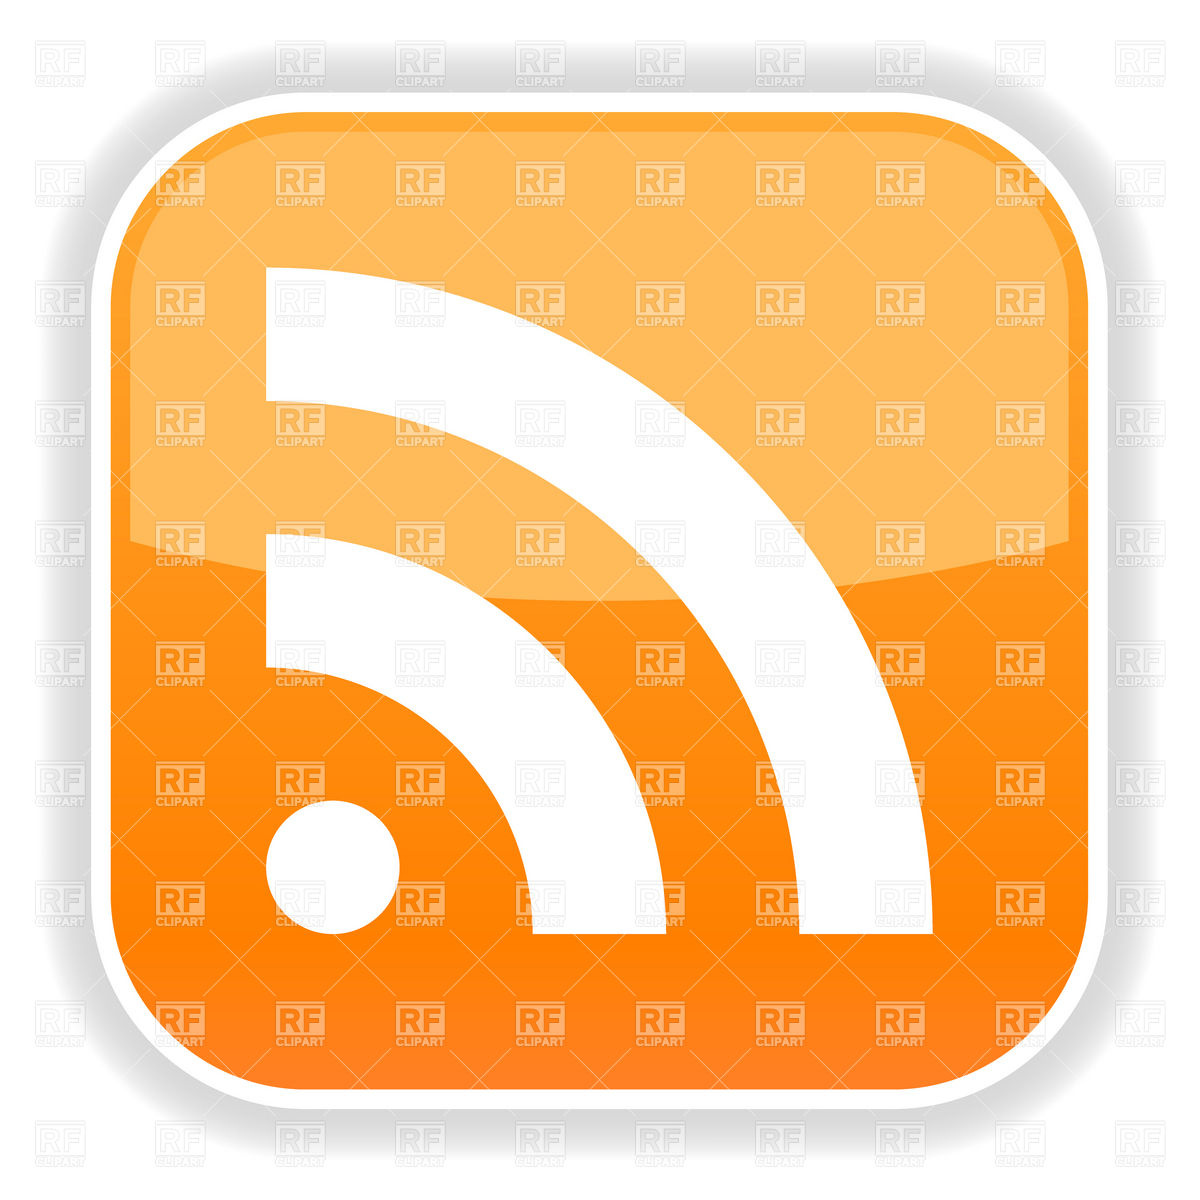 1200x1200 Orange Rss Web Button Vector Image Vector Artwork Of Signs